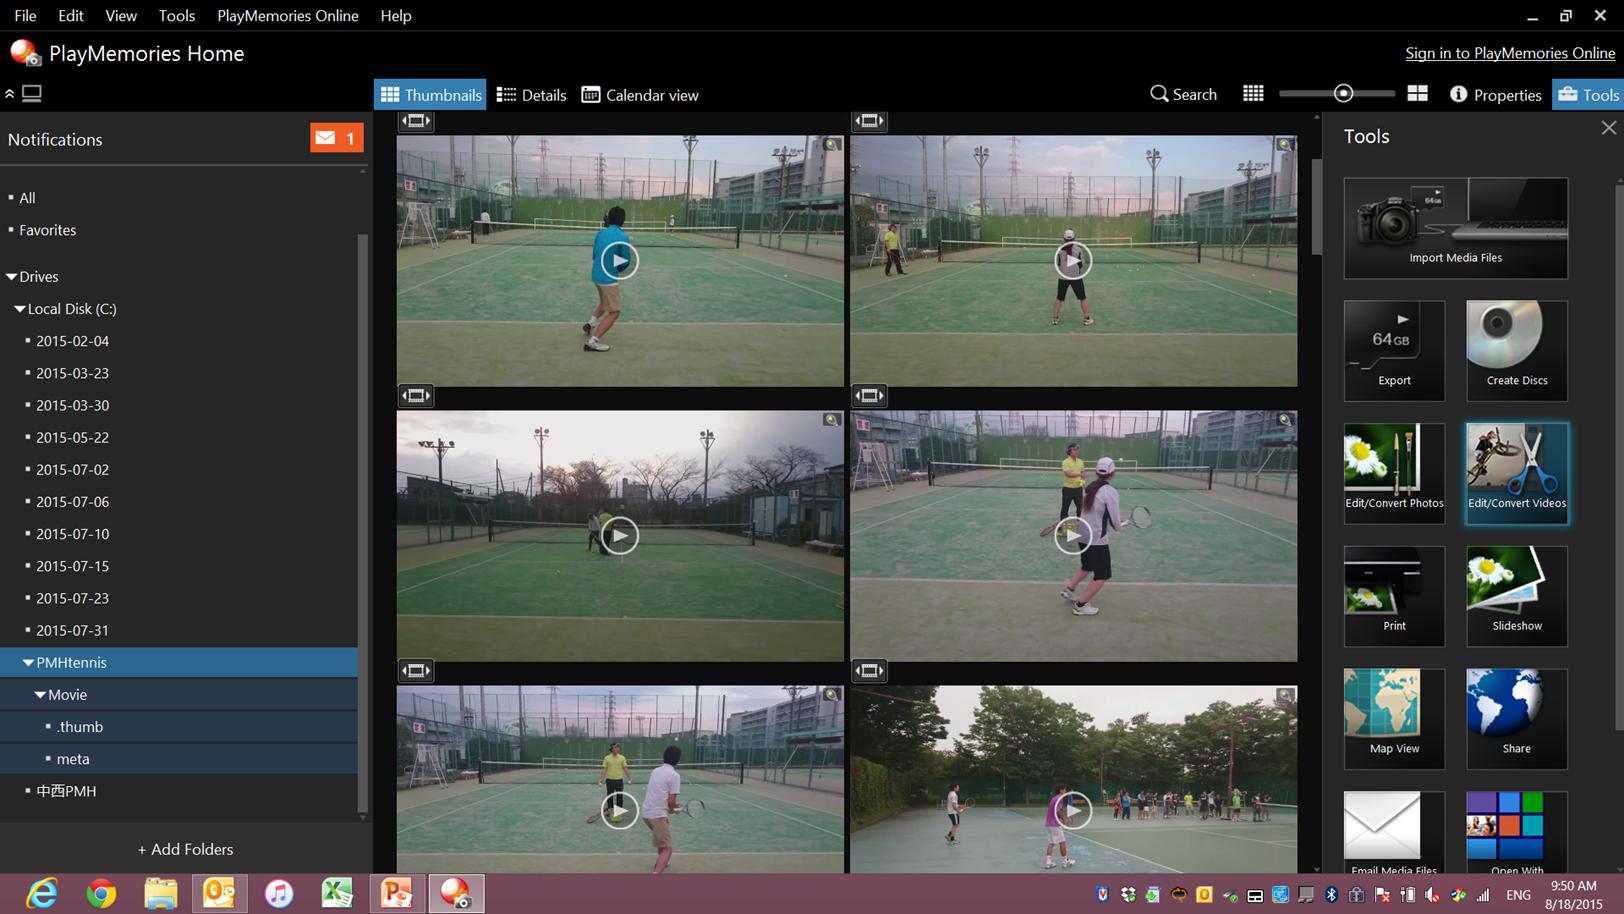 Select [create Tennis Videos]